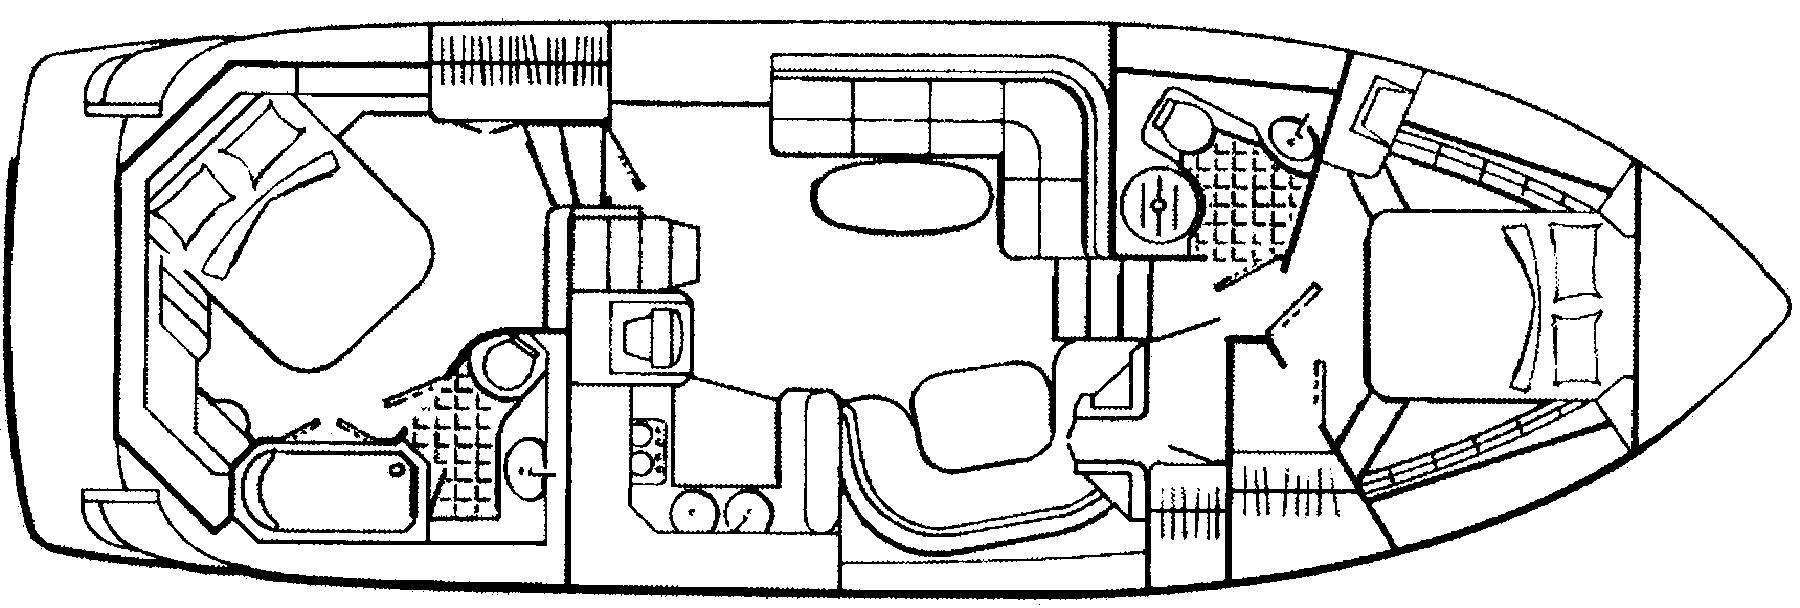 455 Express Motor Yacht Floor Plan 1